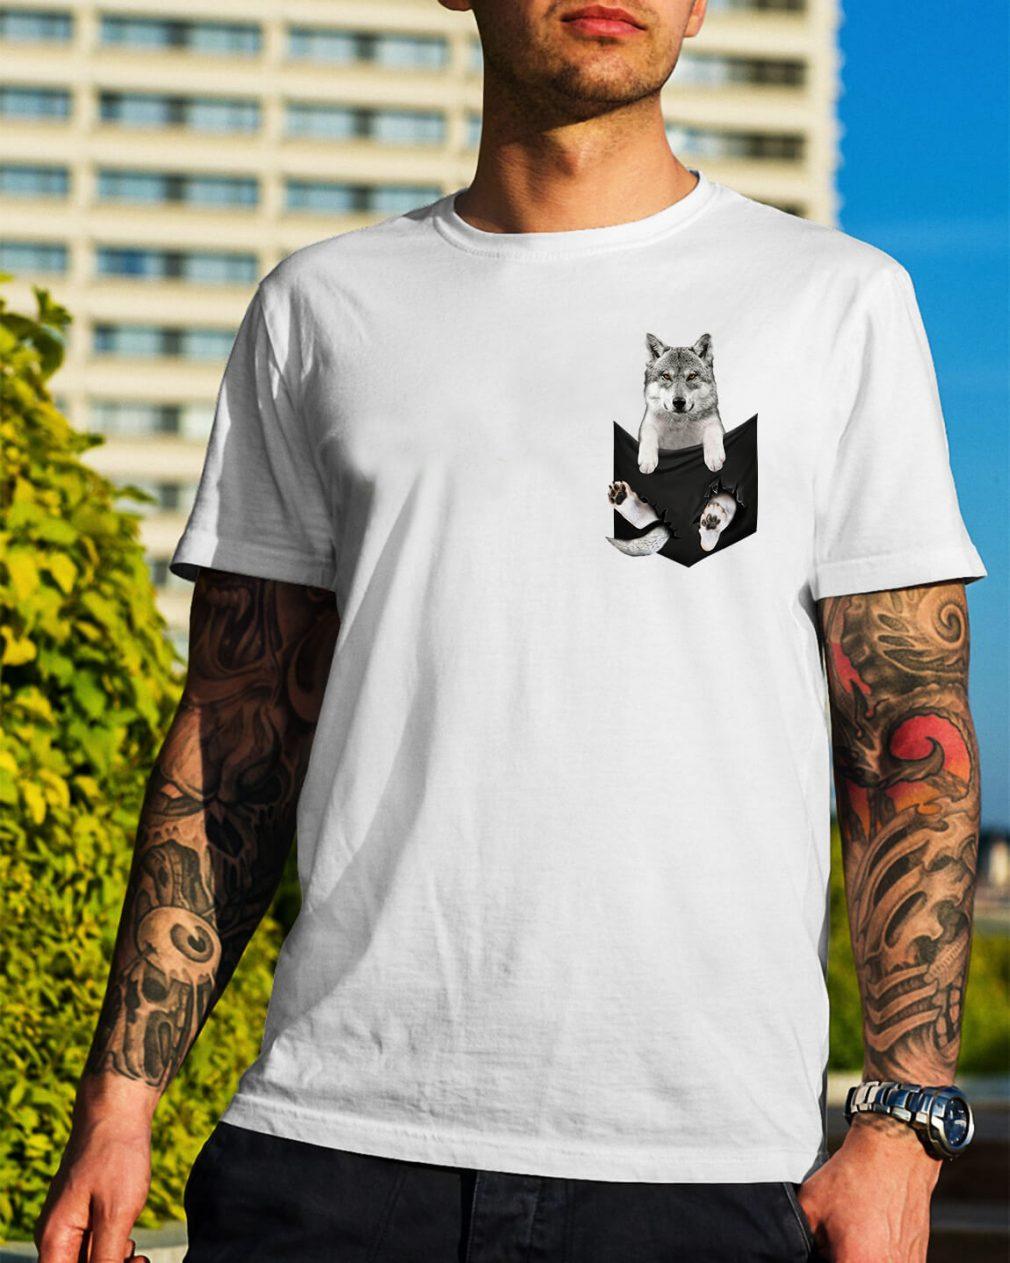 Husky in a pocket shirt